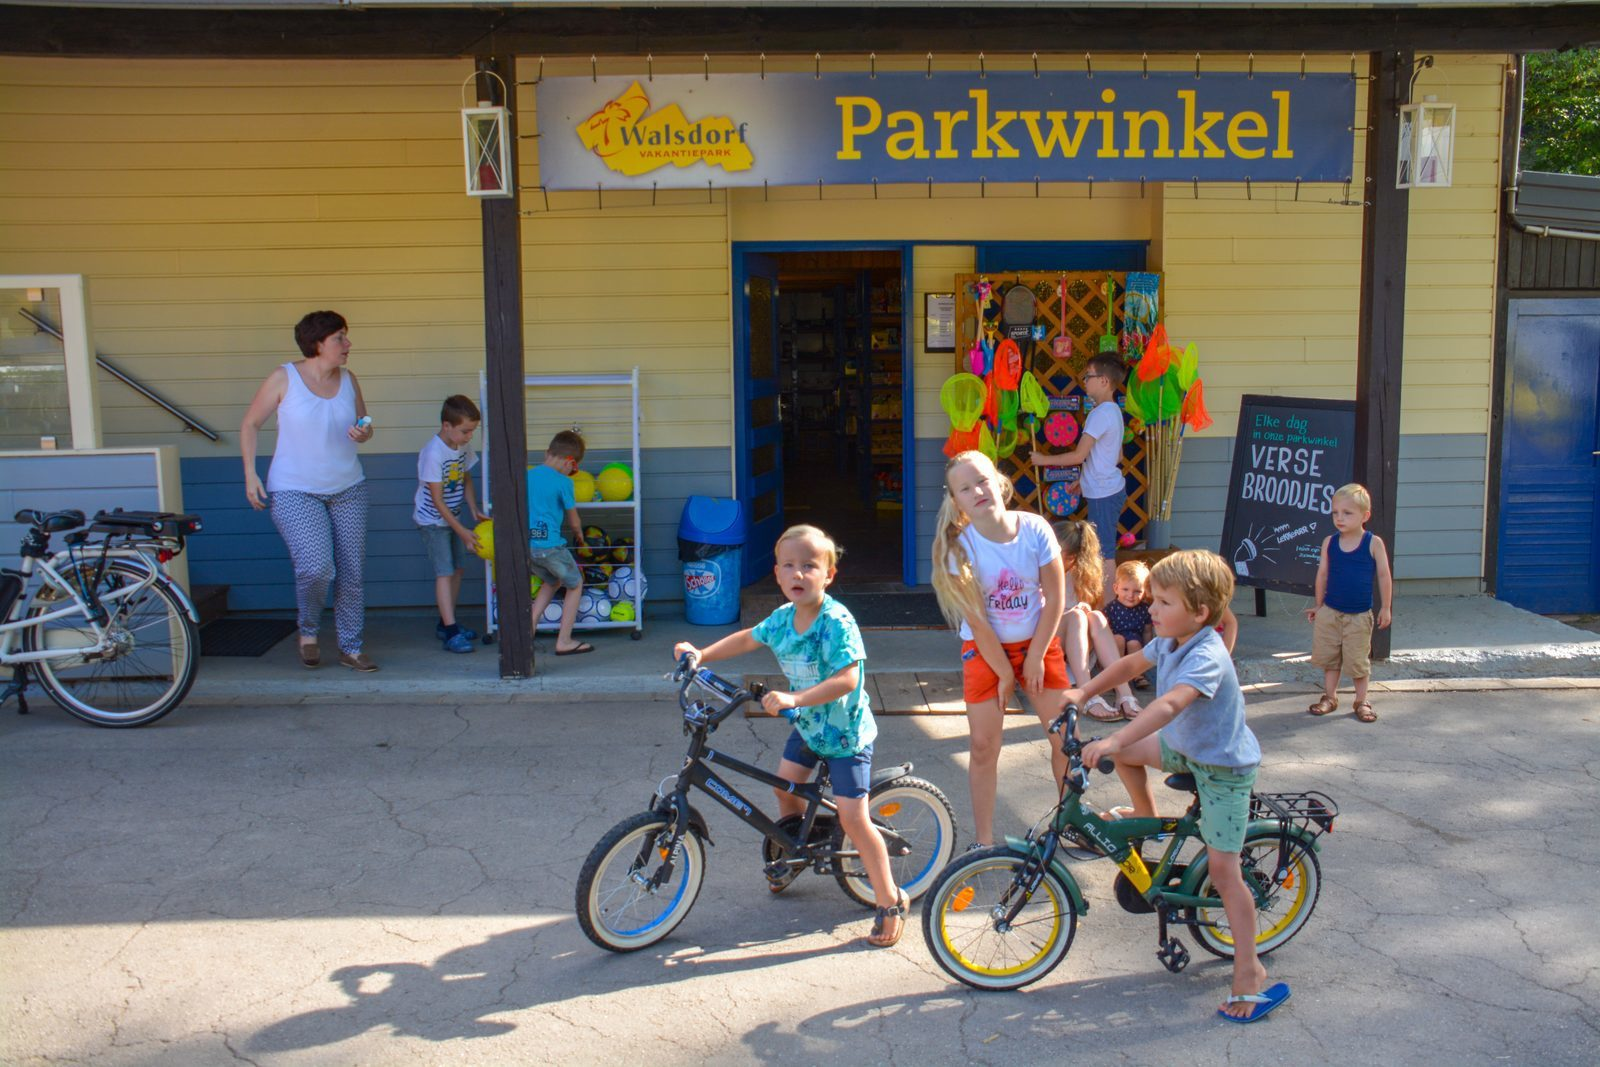 Parkwinkel